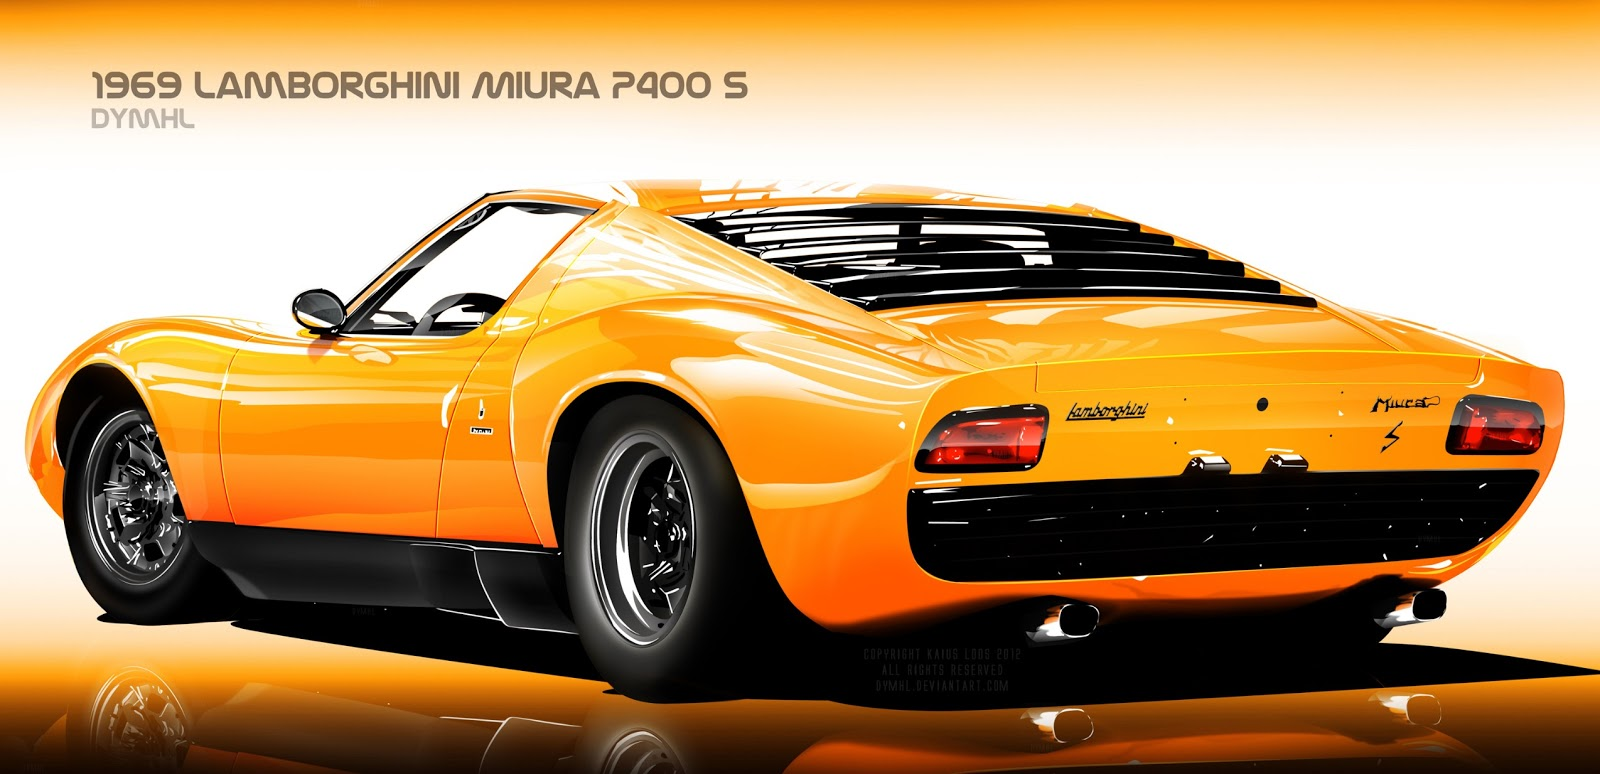 Luxury Lamborghini Cars Lamborghini Miura